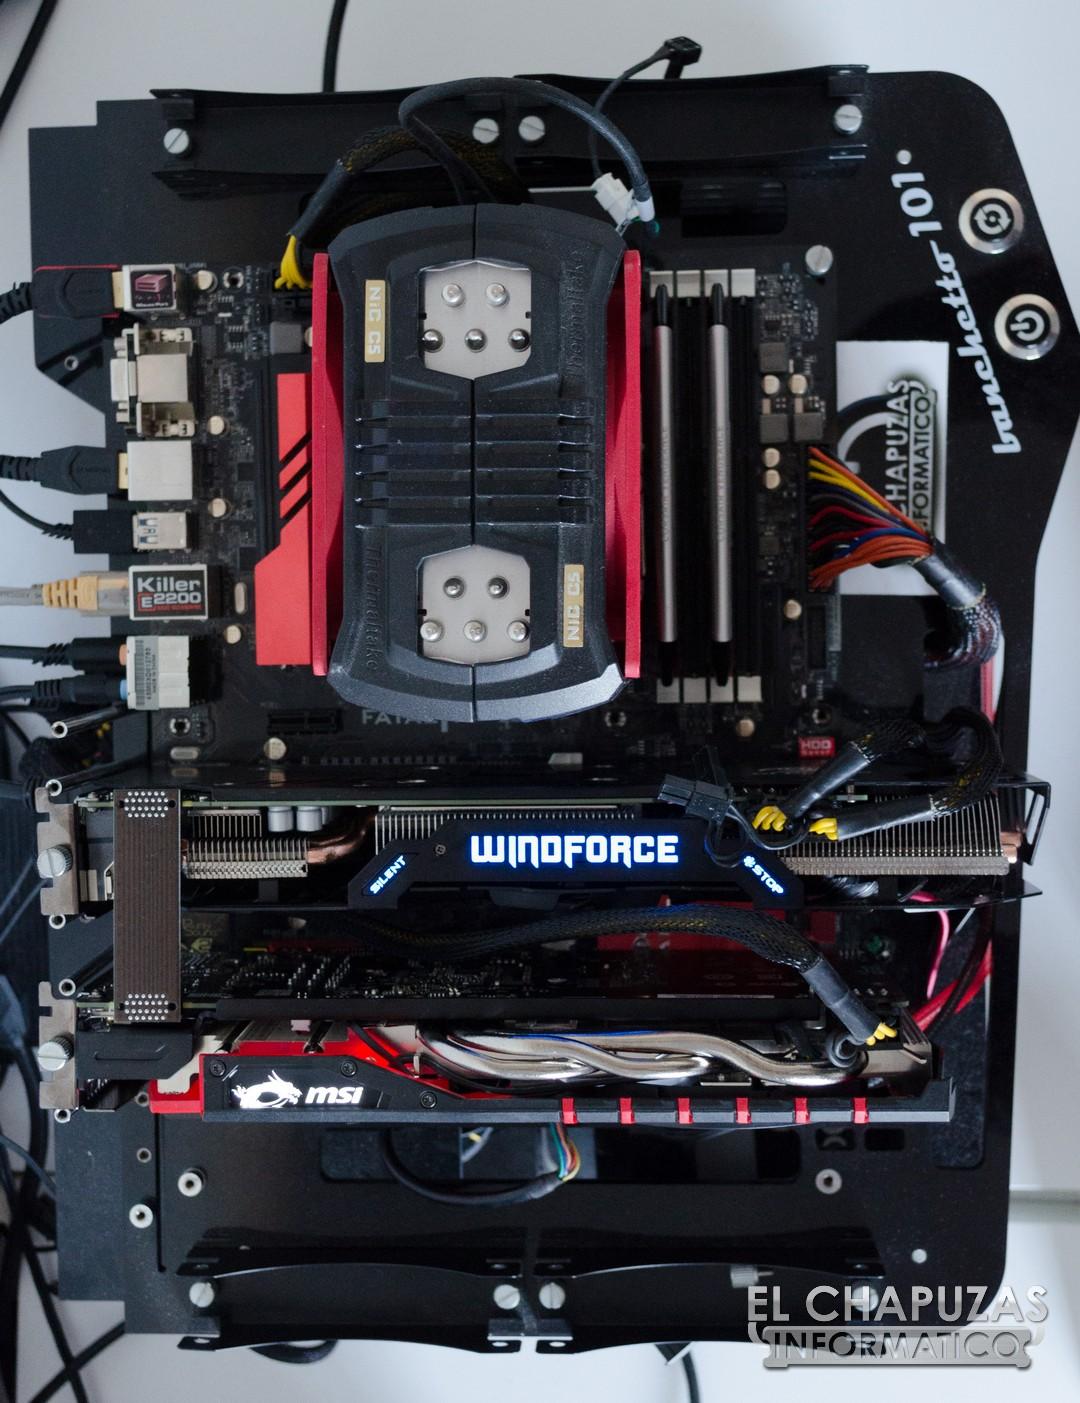 Nvidia GeForce GTX 960 SLI [Review]